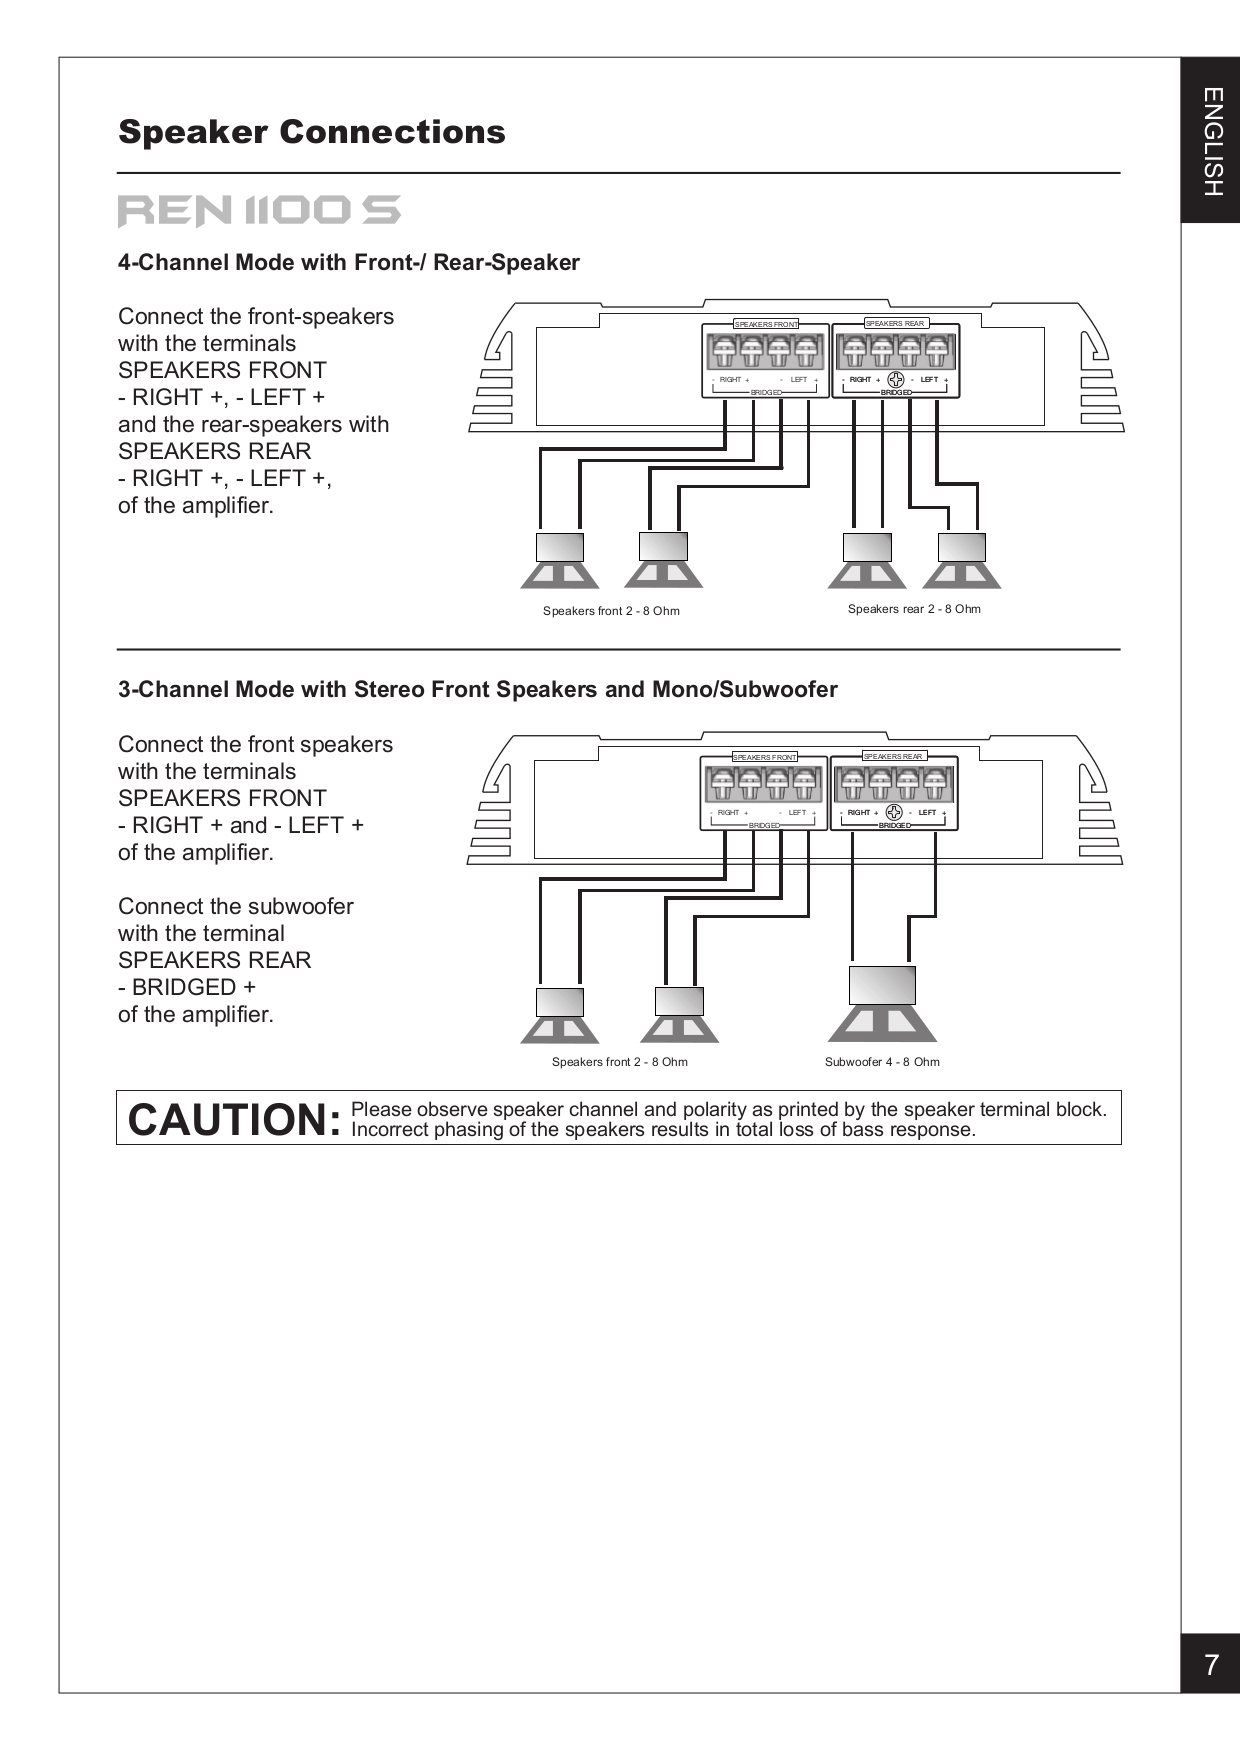 pdf manual for renegade car amplifier ren 550 s rh umlib com Sanyo Car Amplifier Renegade Amps